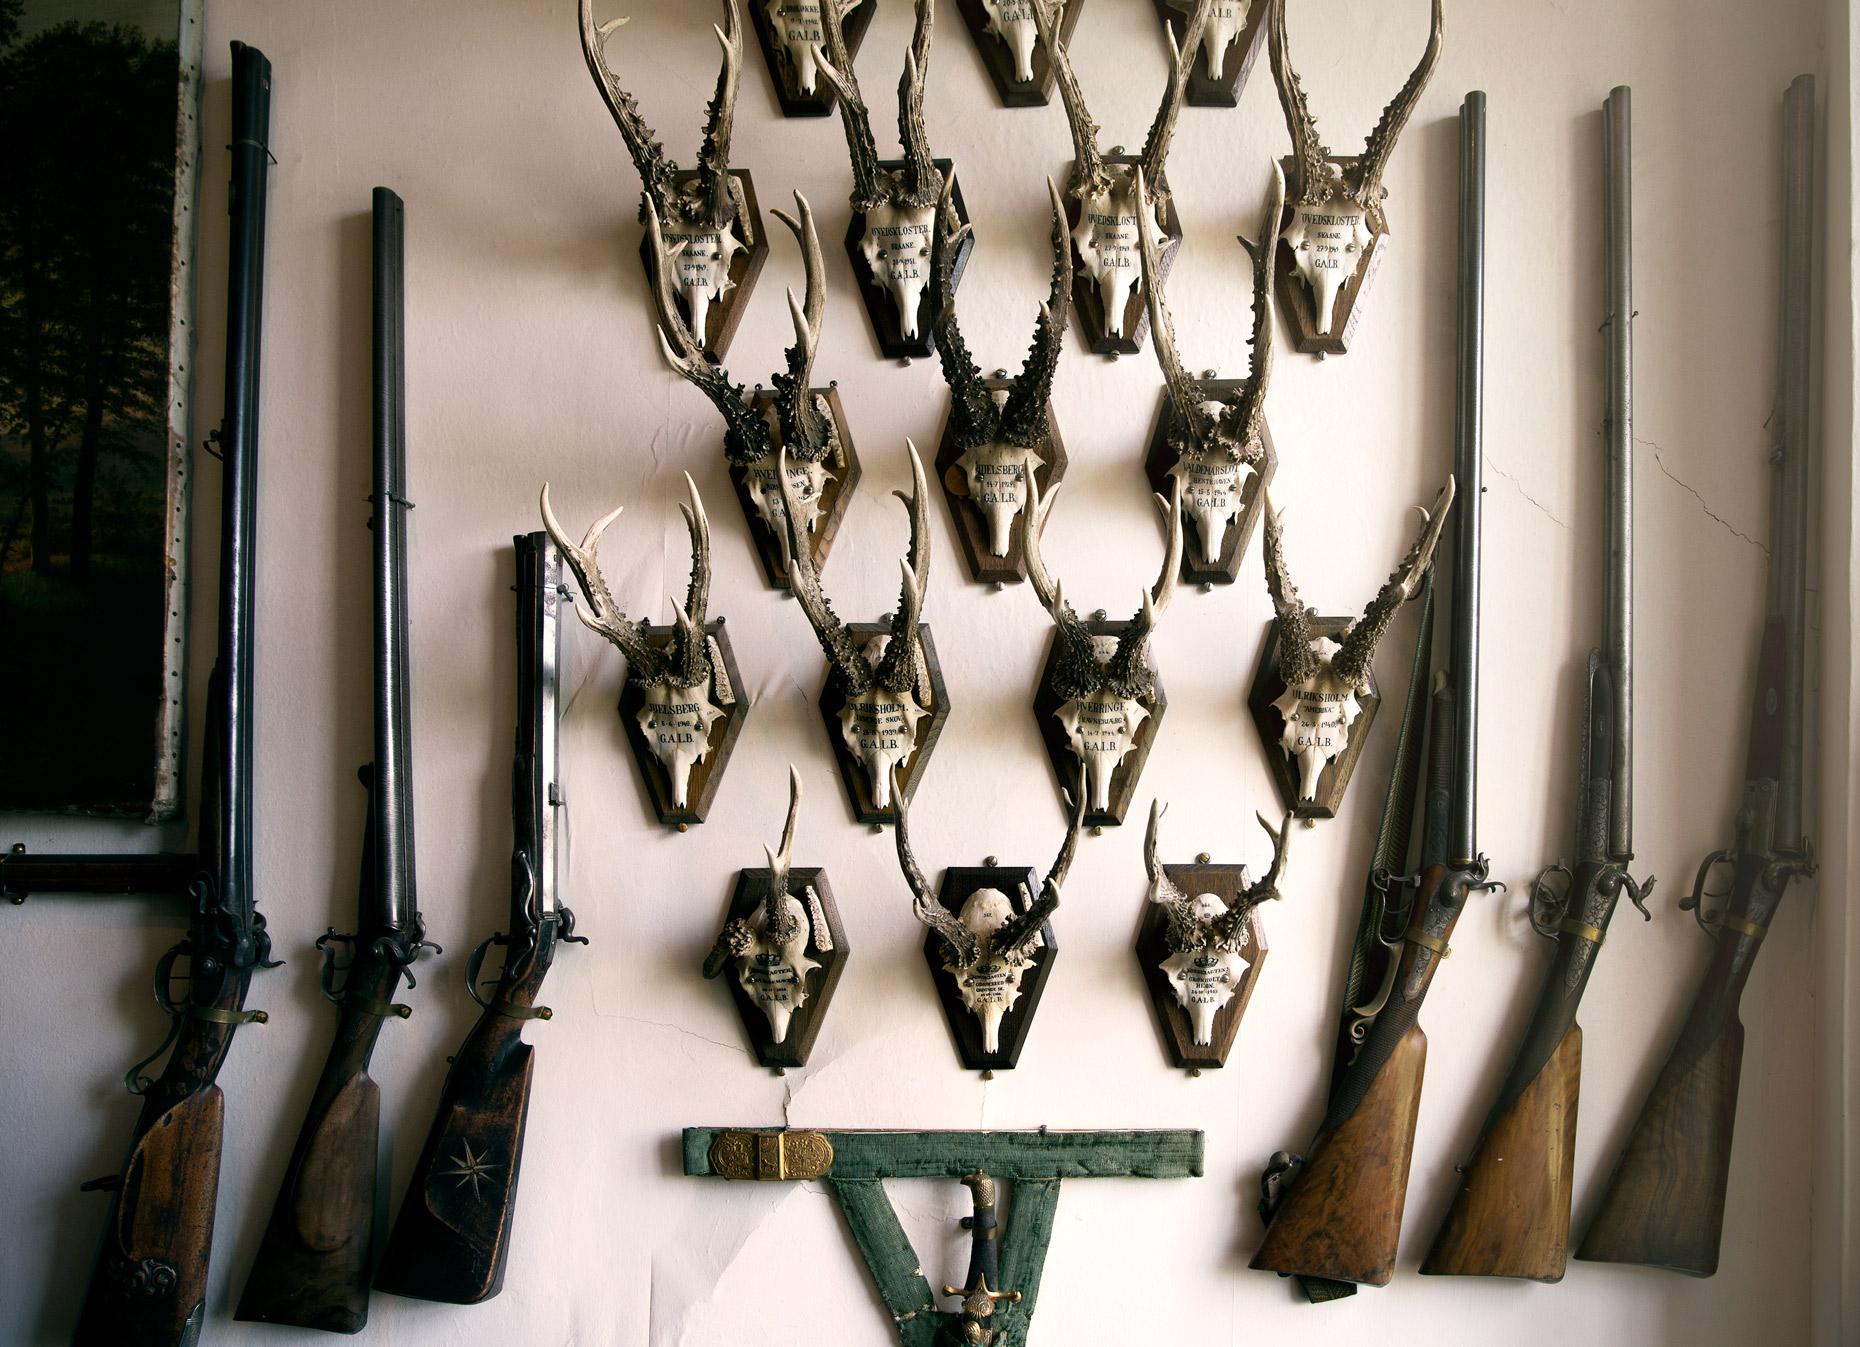 Product Photography Still Life Derek Israelsen Skulls Hunting trophies